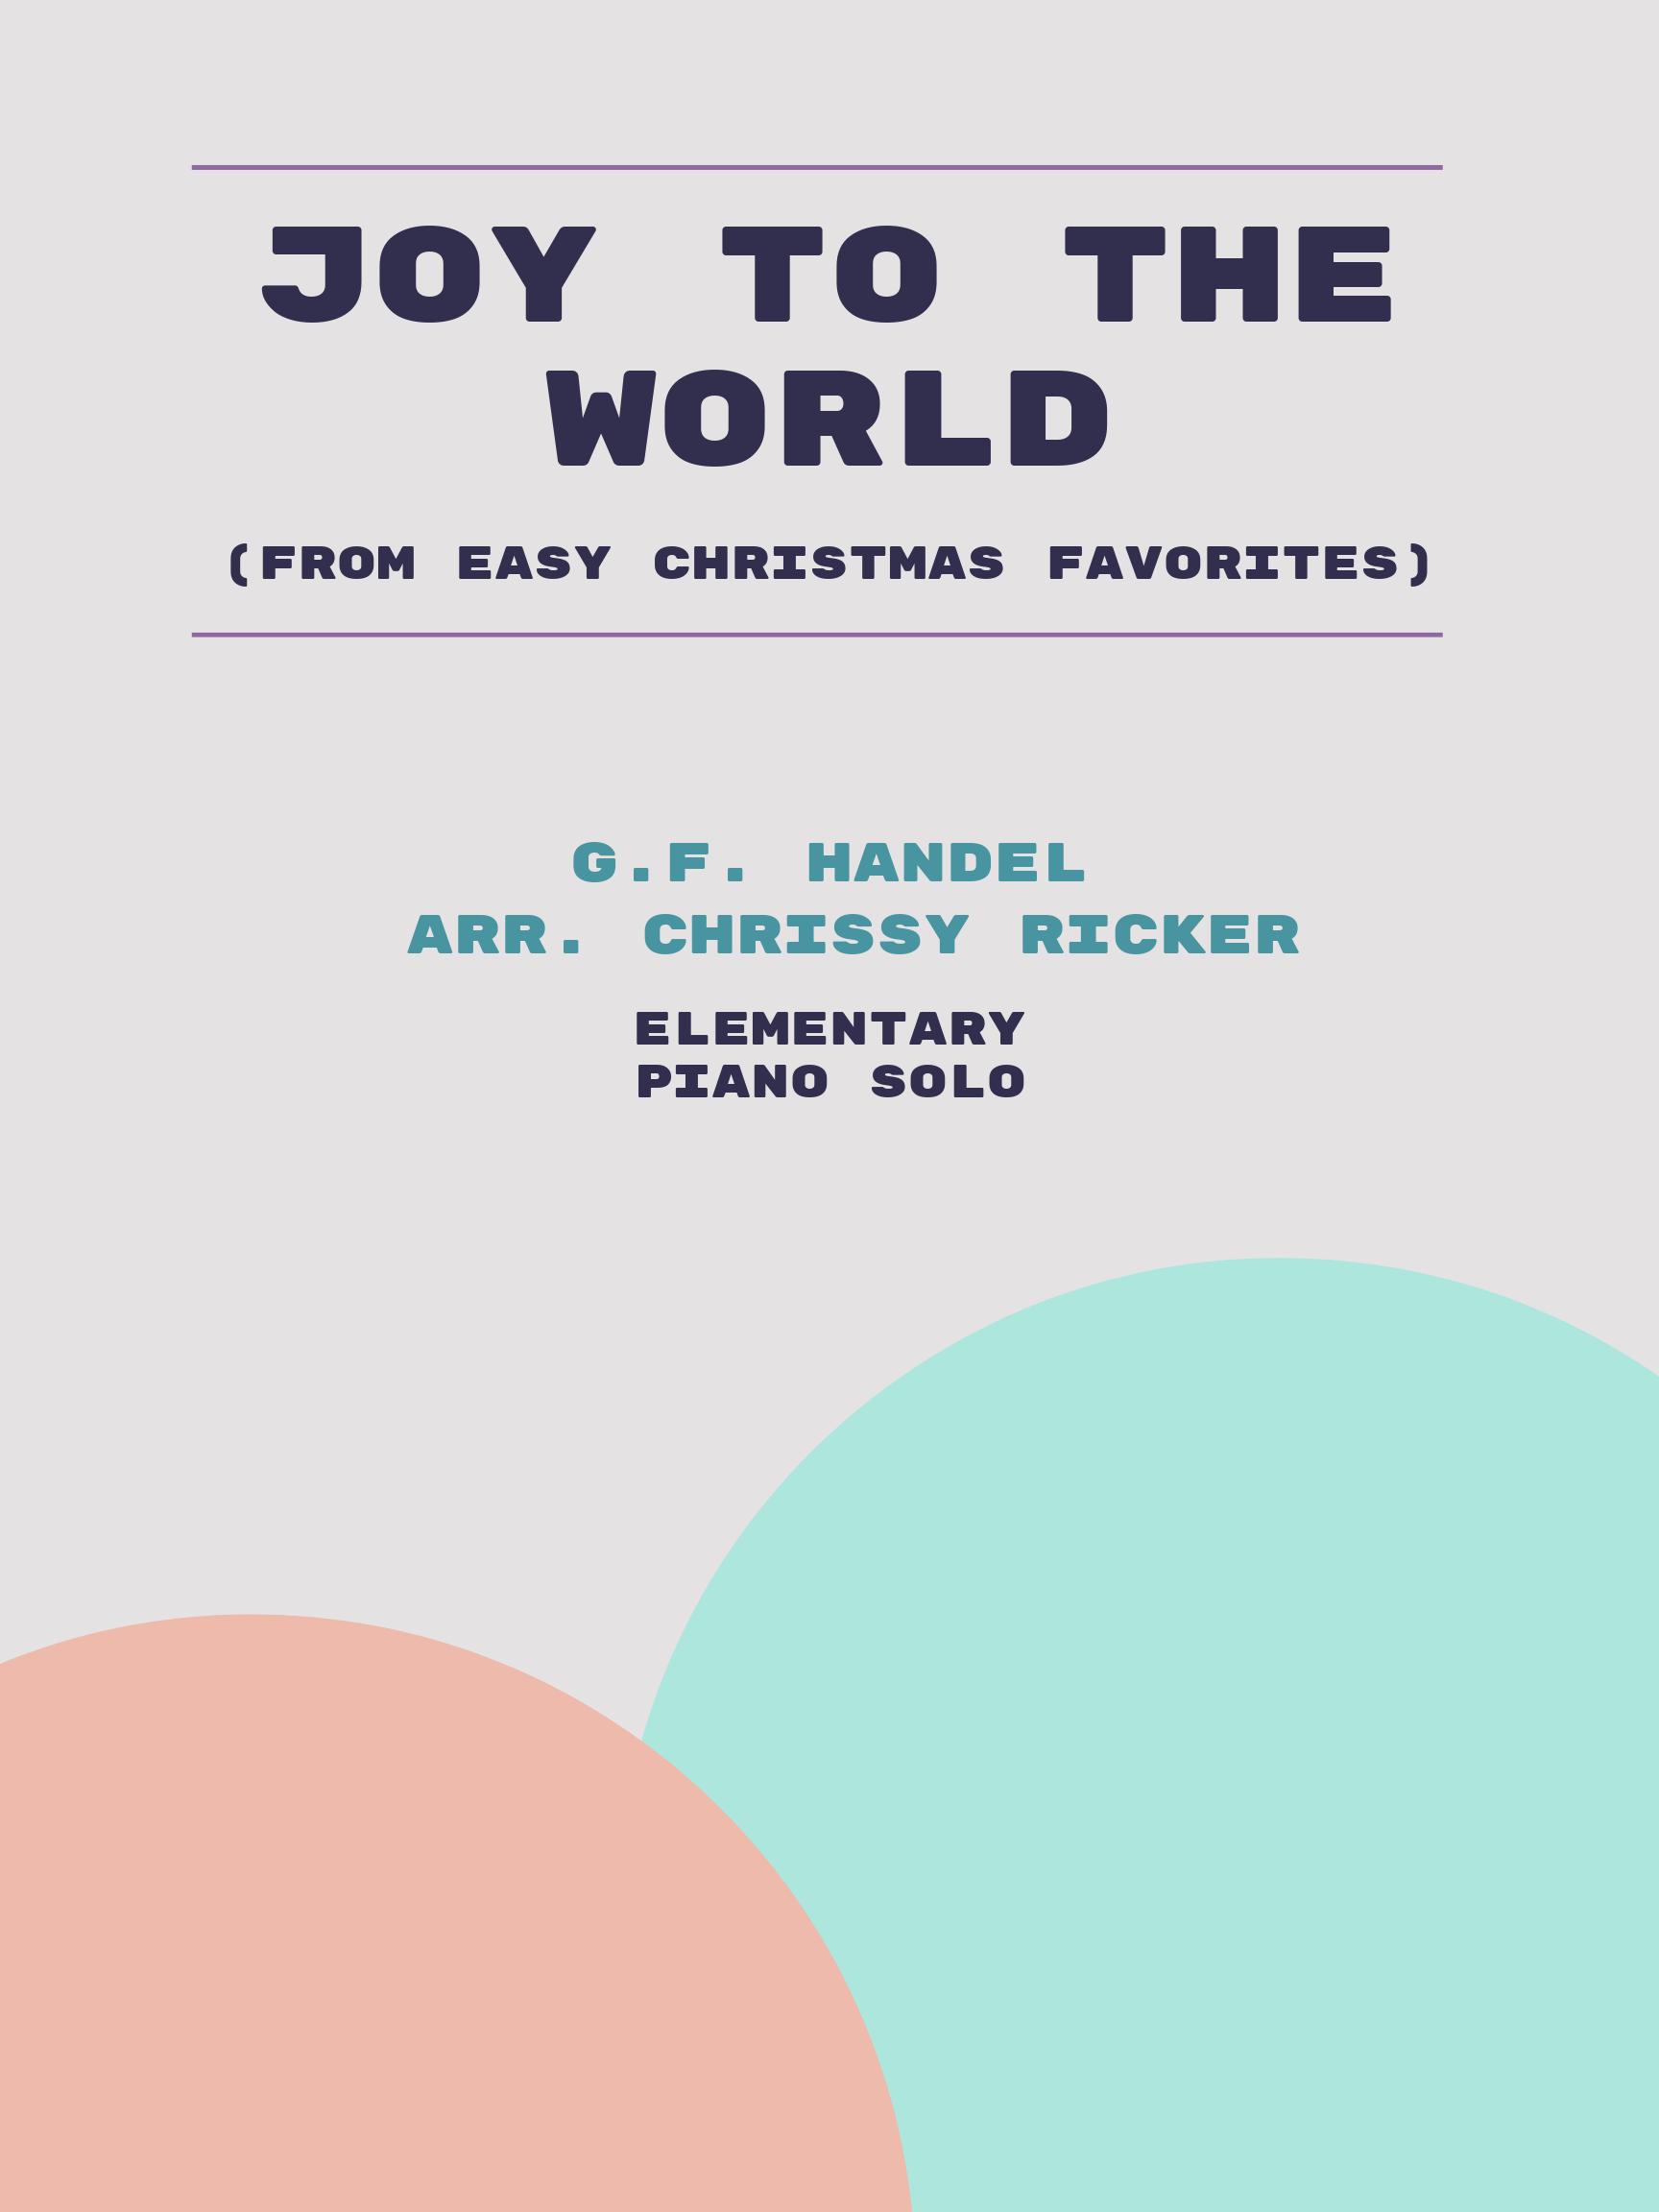 Joy to the World by G.F. Handel